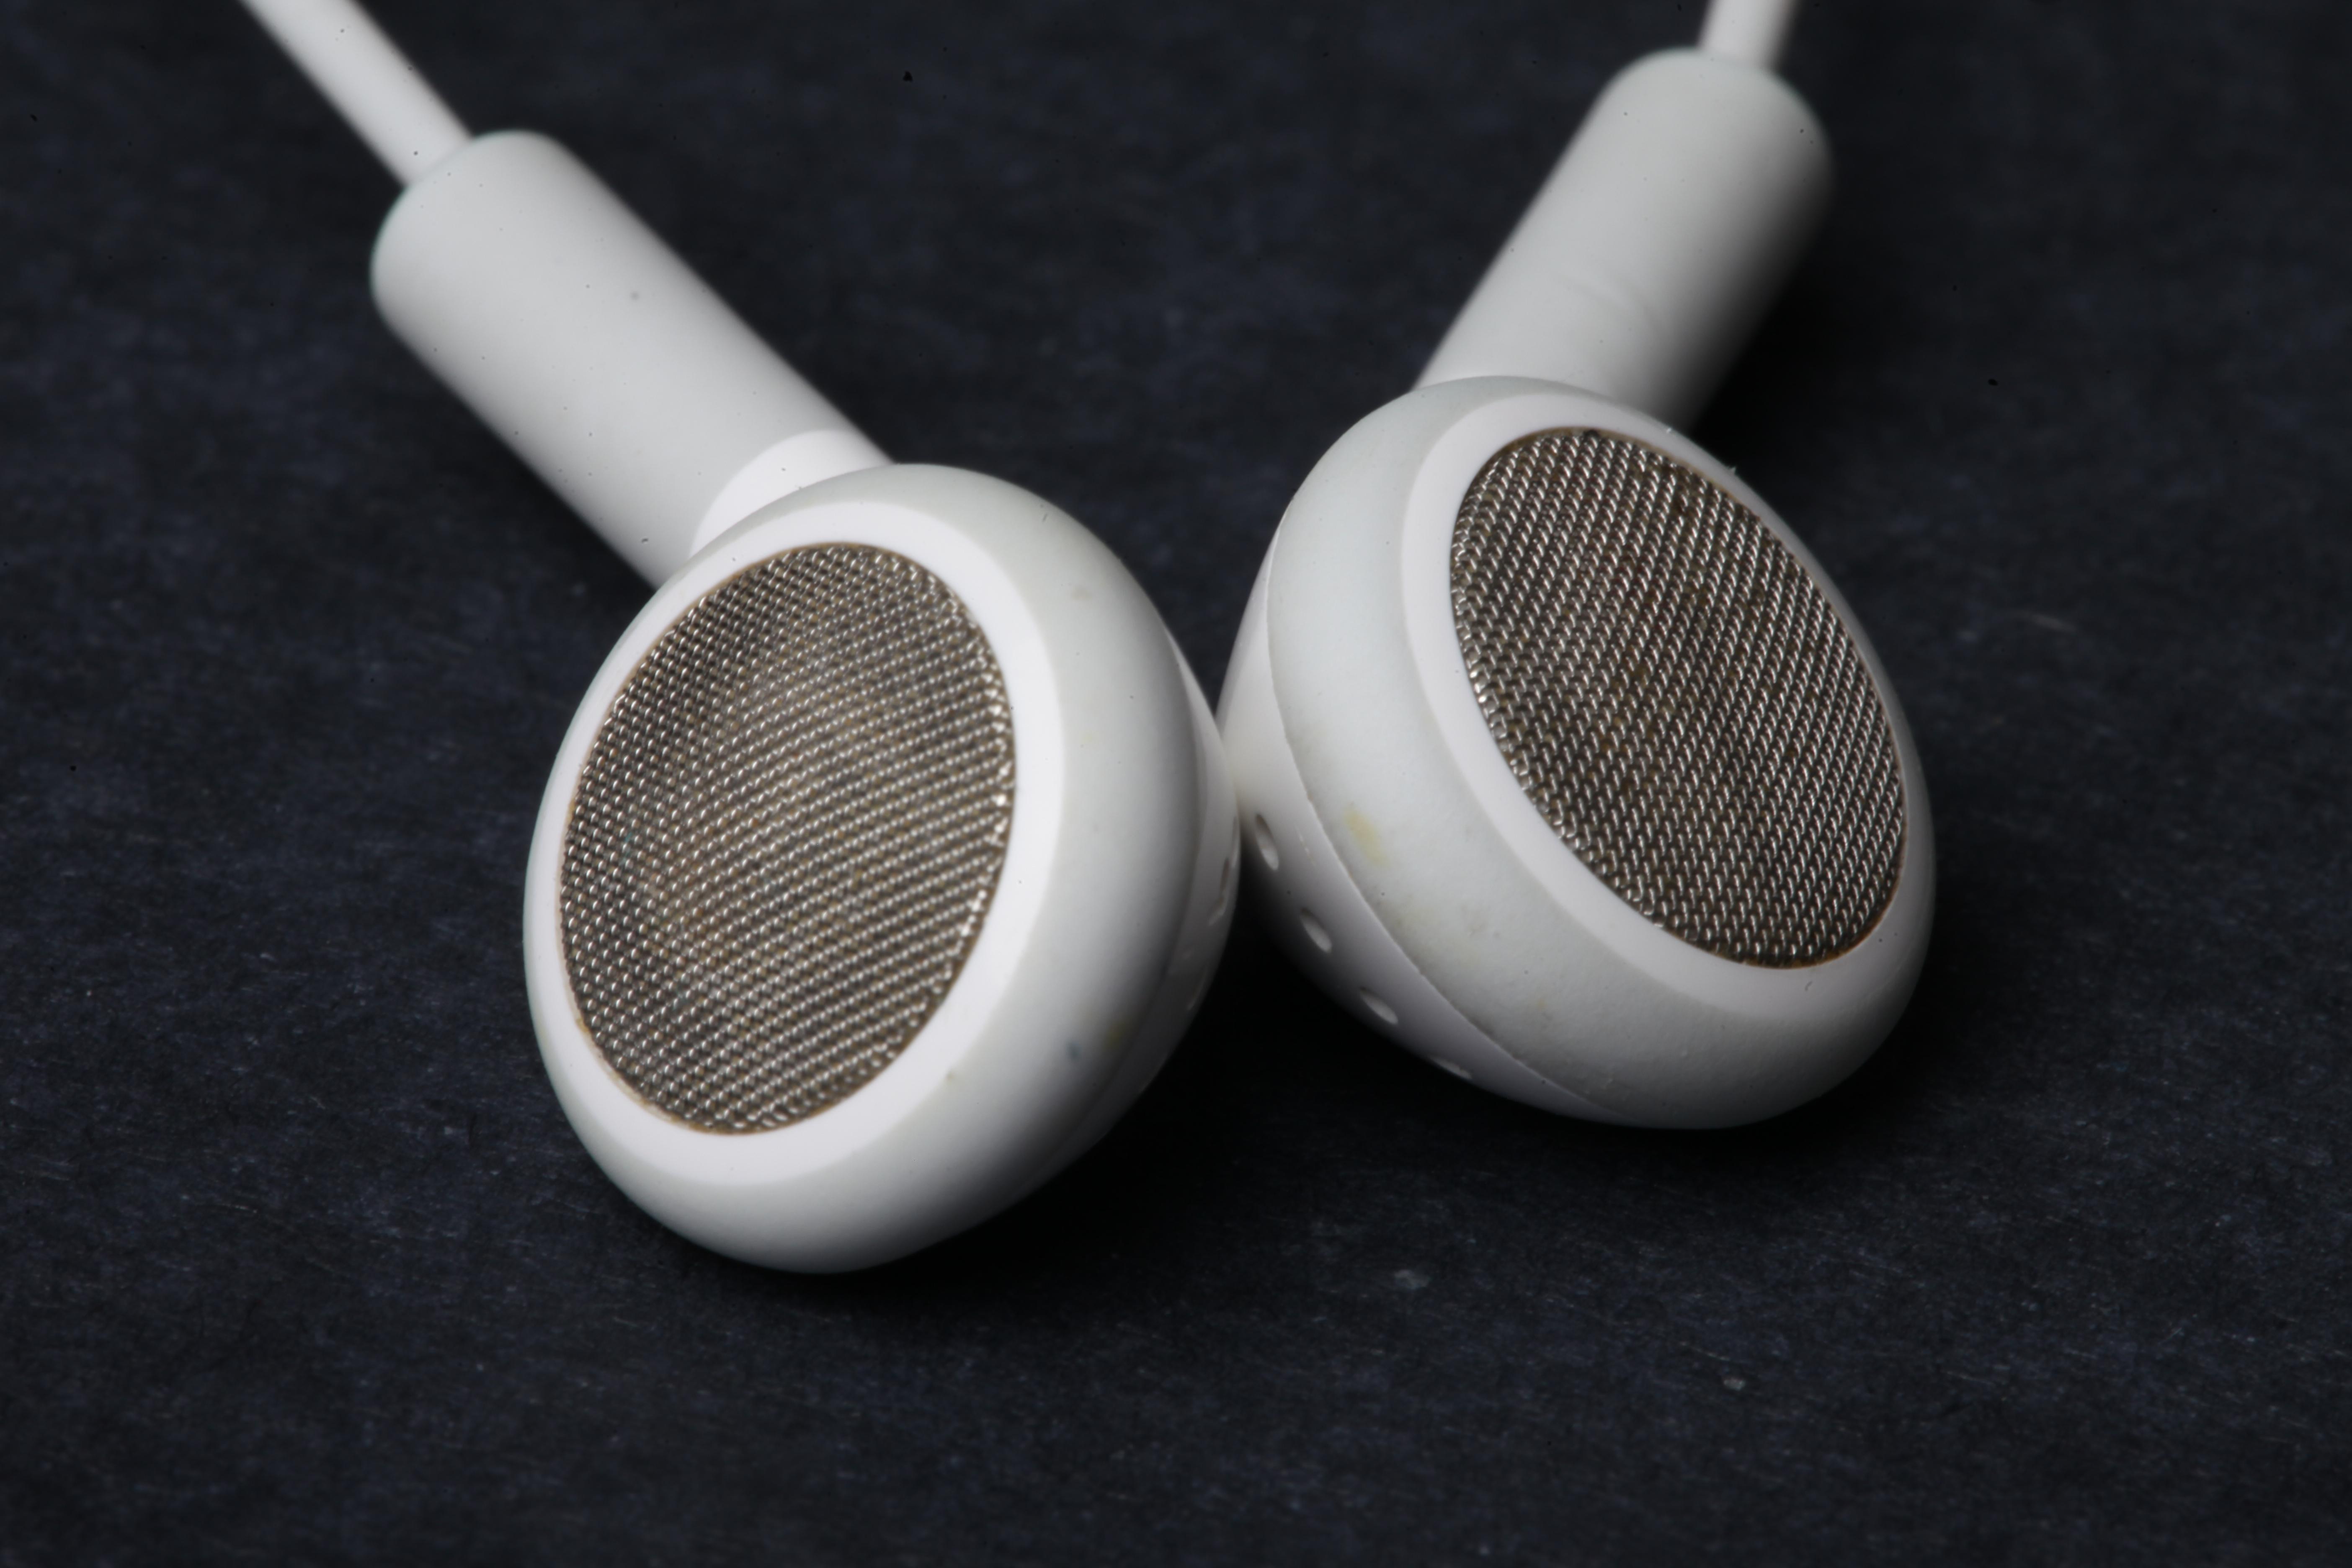 Headphones, Earphones, Listen, Music, Plug, HQ Photo